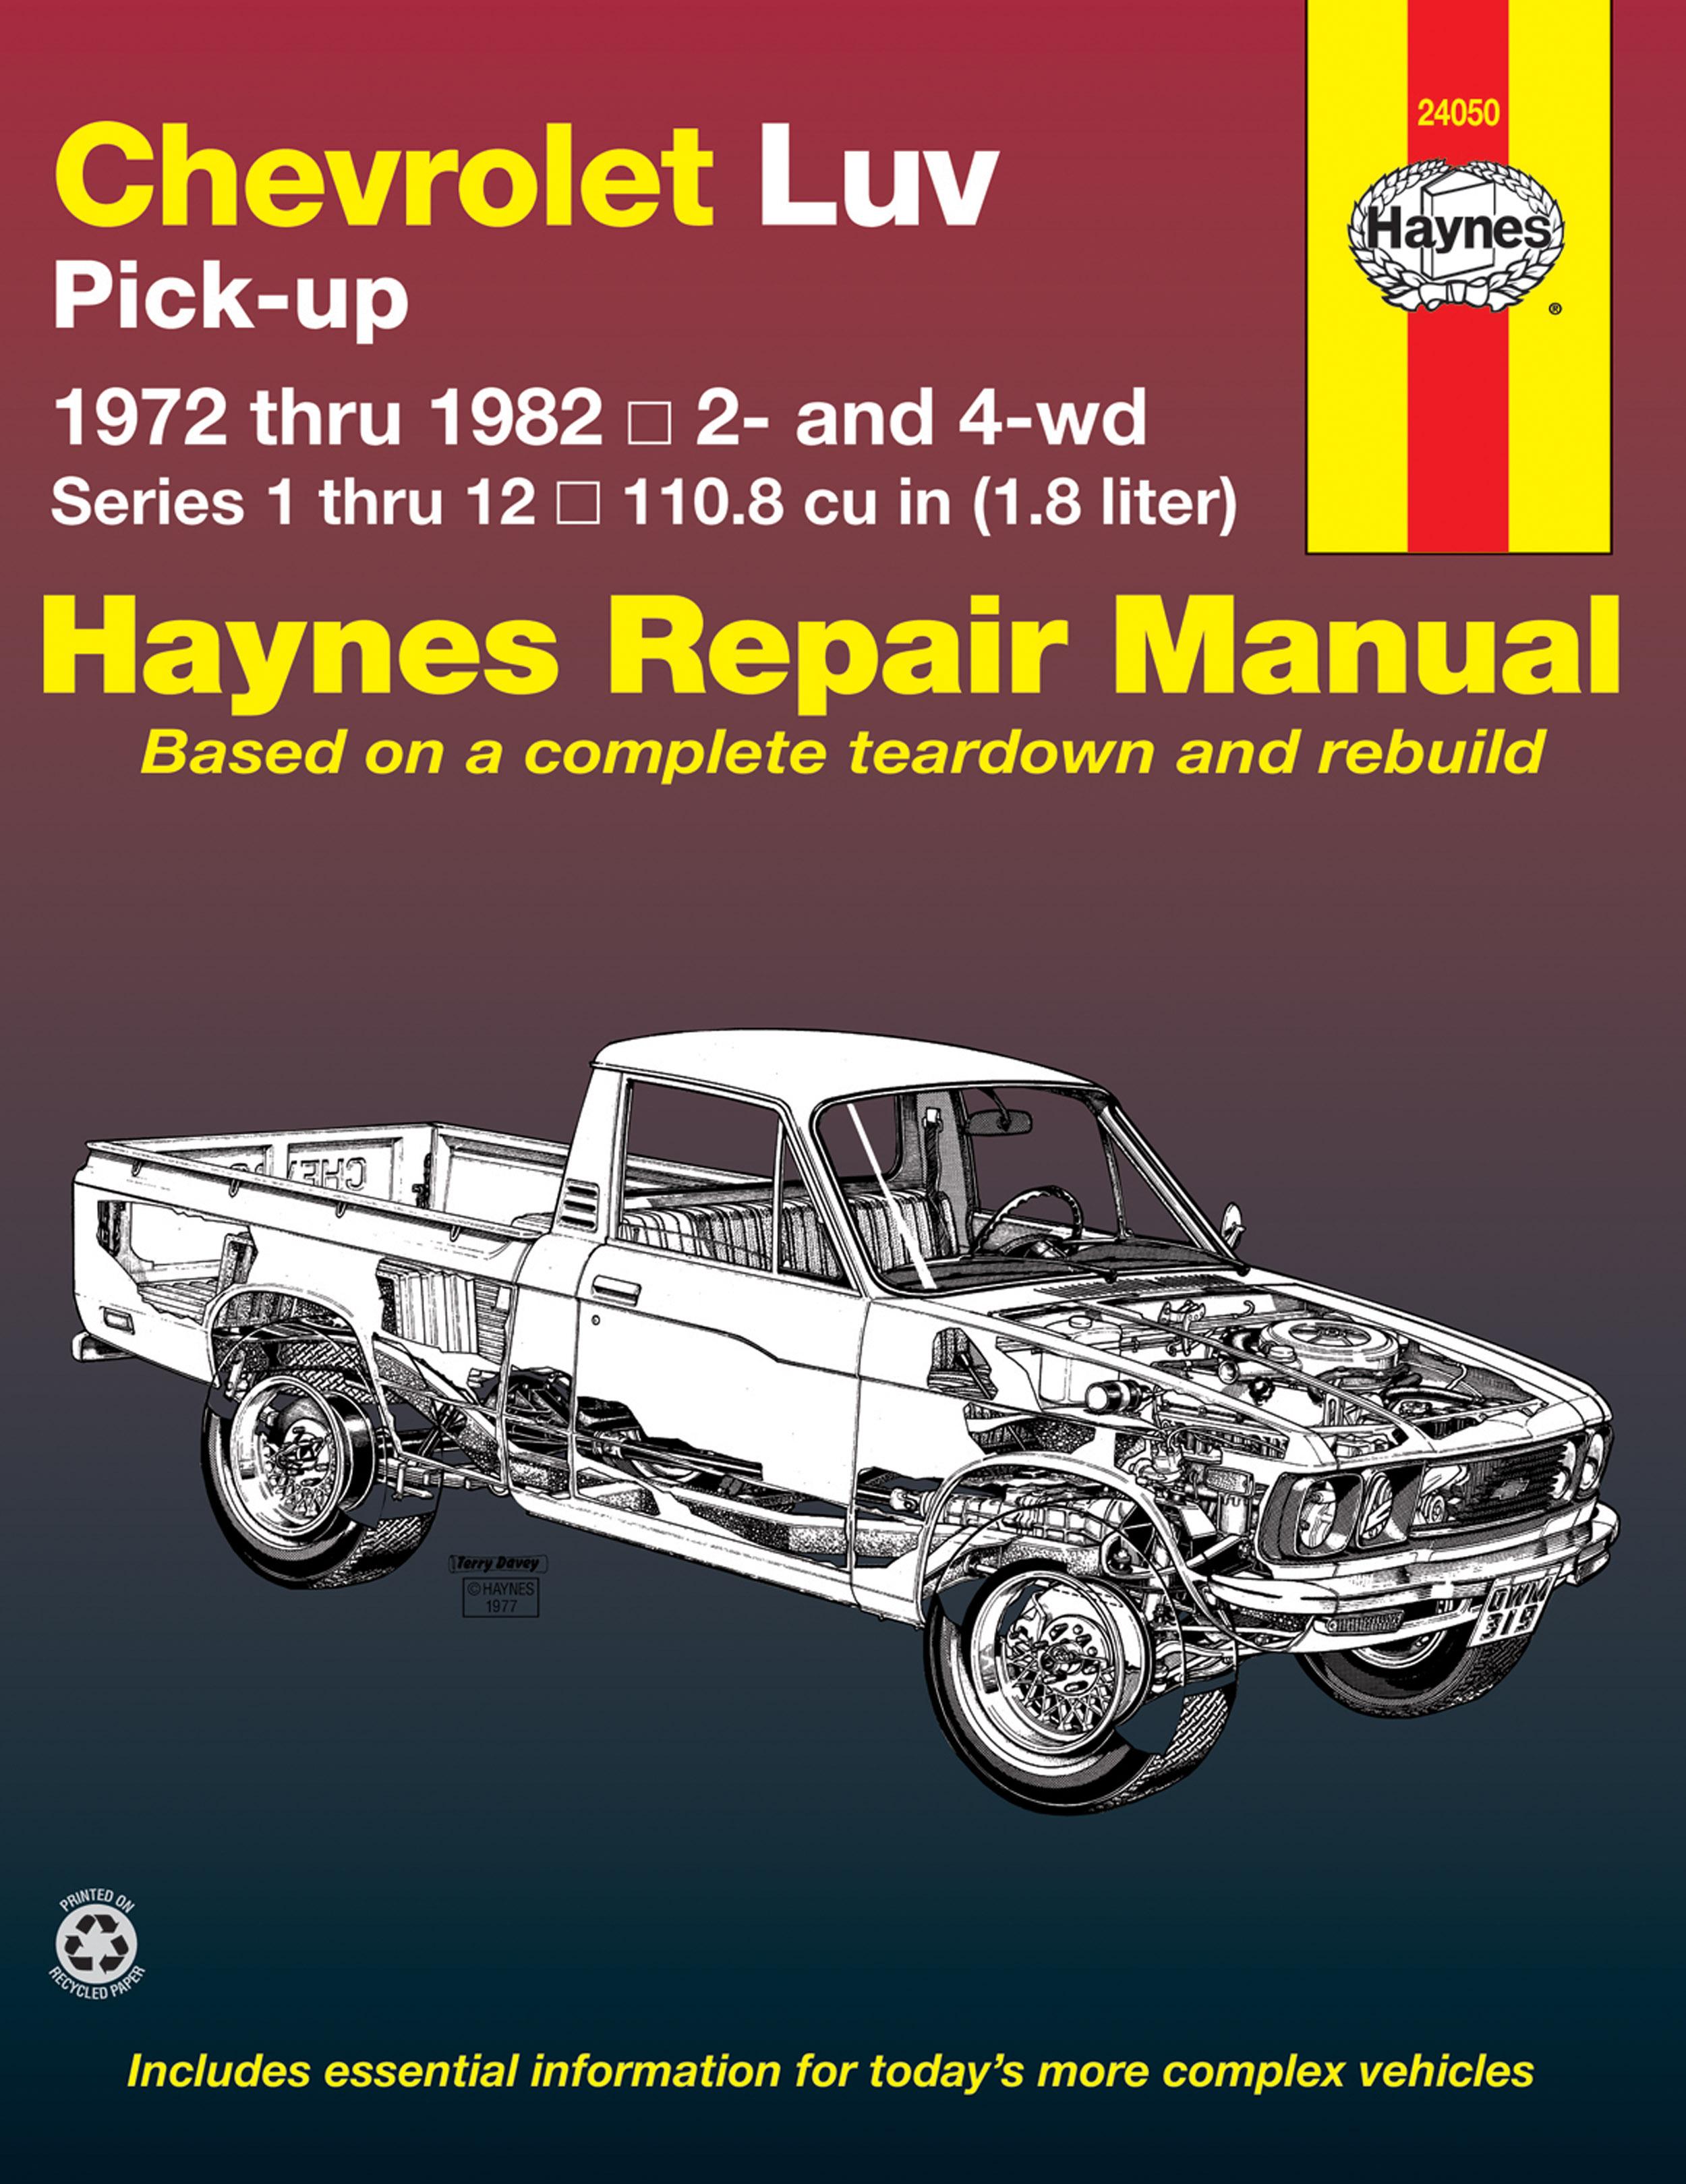 Enlarge Chevrolet Luv Pick-up petrol (1972-1982) petrol Haynes Repair Manual  (